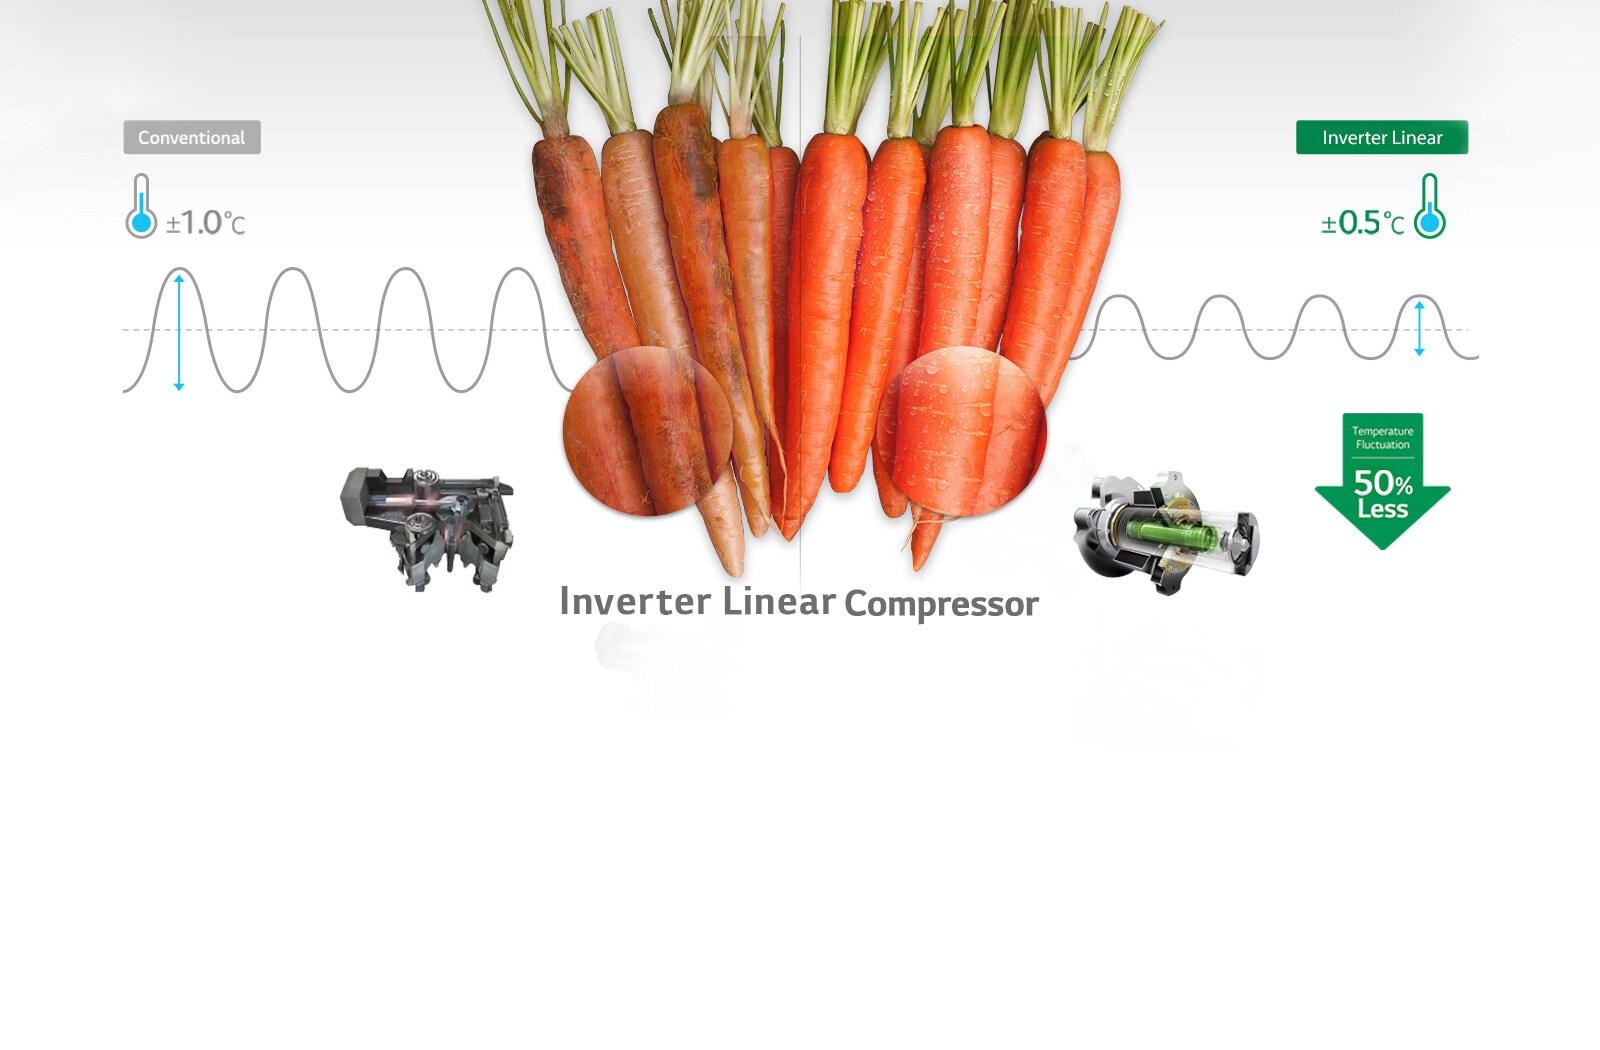 LG GL-T292RBC3 260 Ltr Inverter Linear Compressor